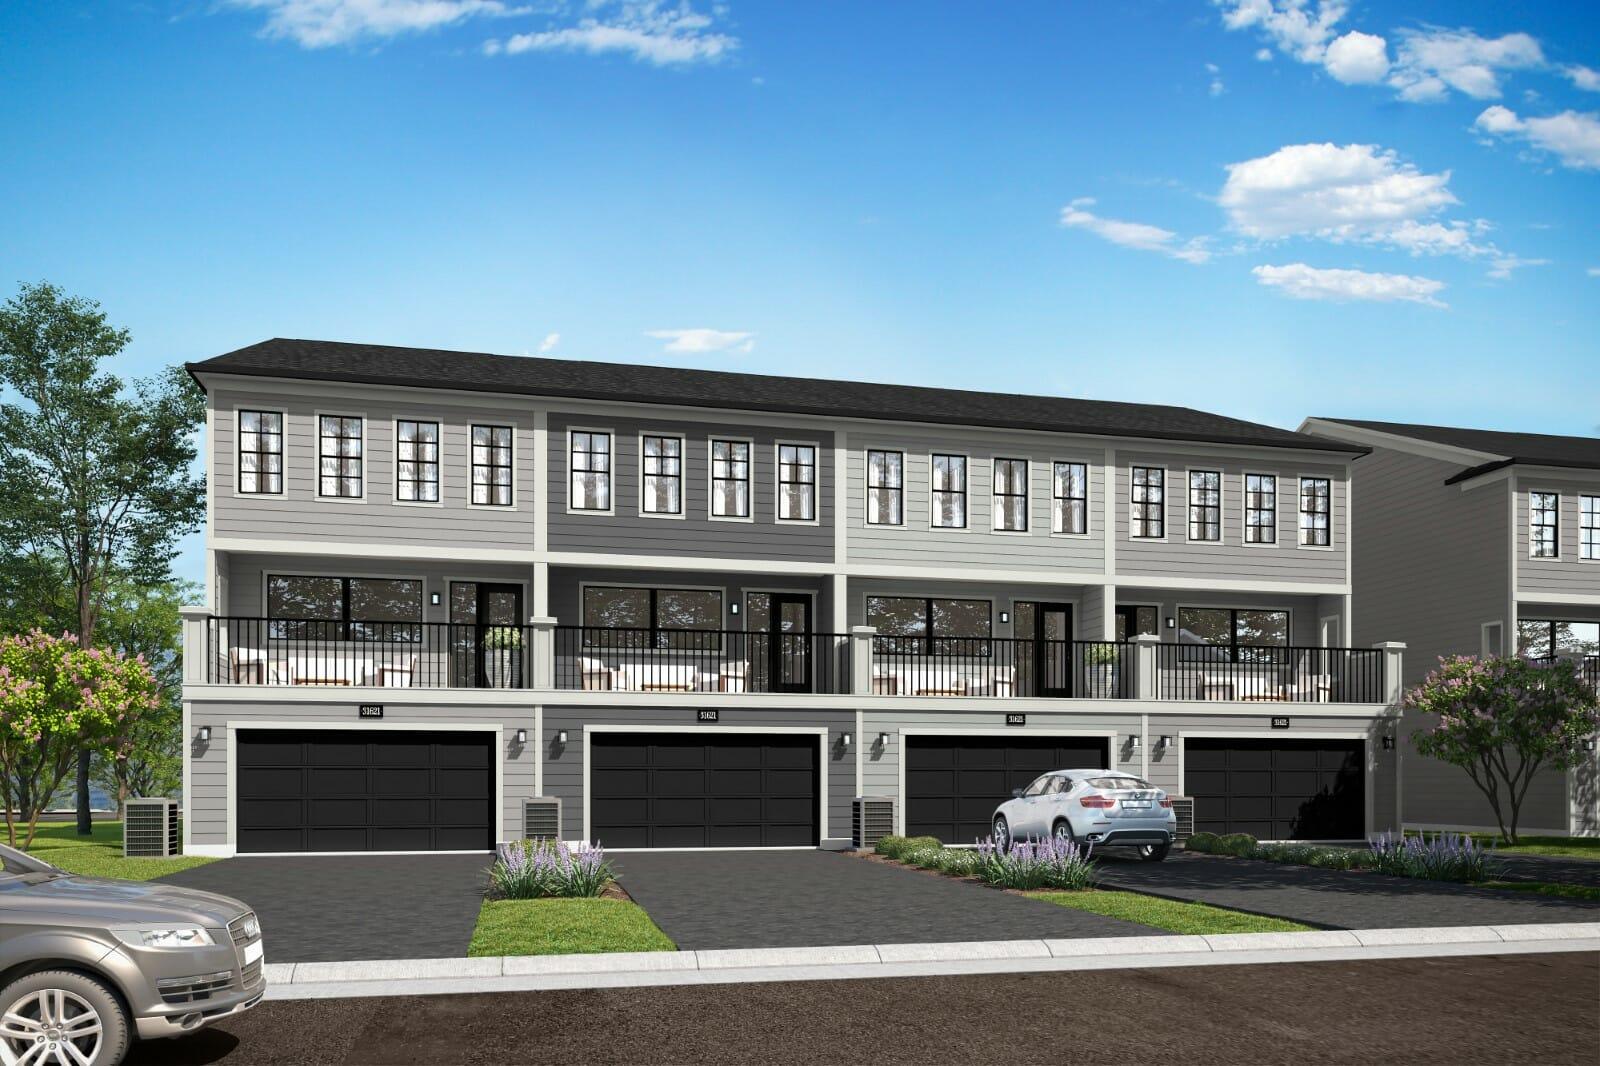 55+ Townhomes Woodbridge VA | Belmont Bay | Riverside Living